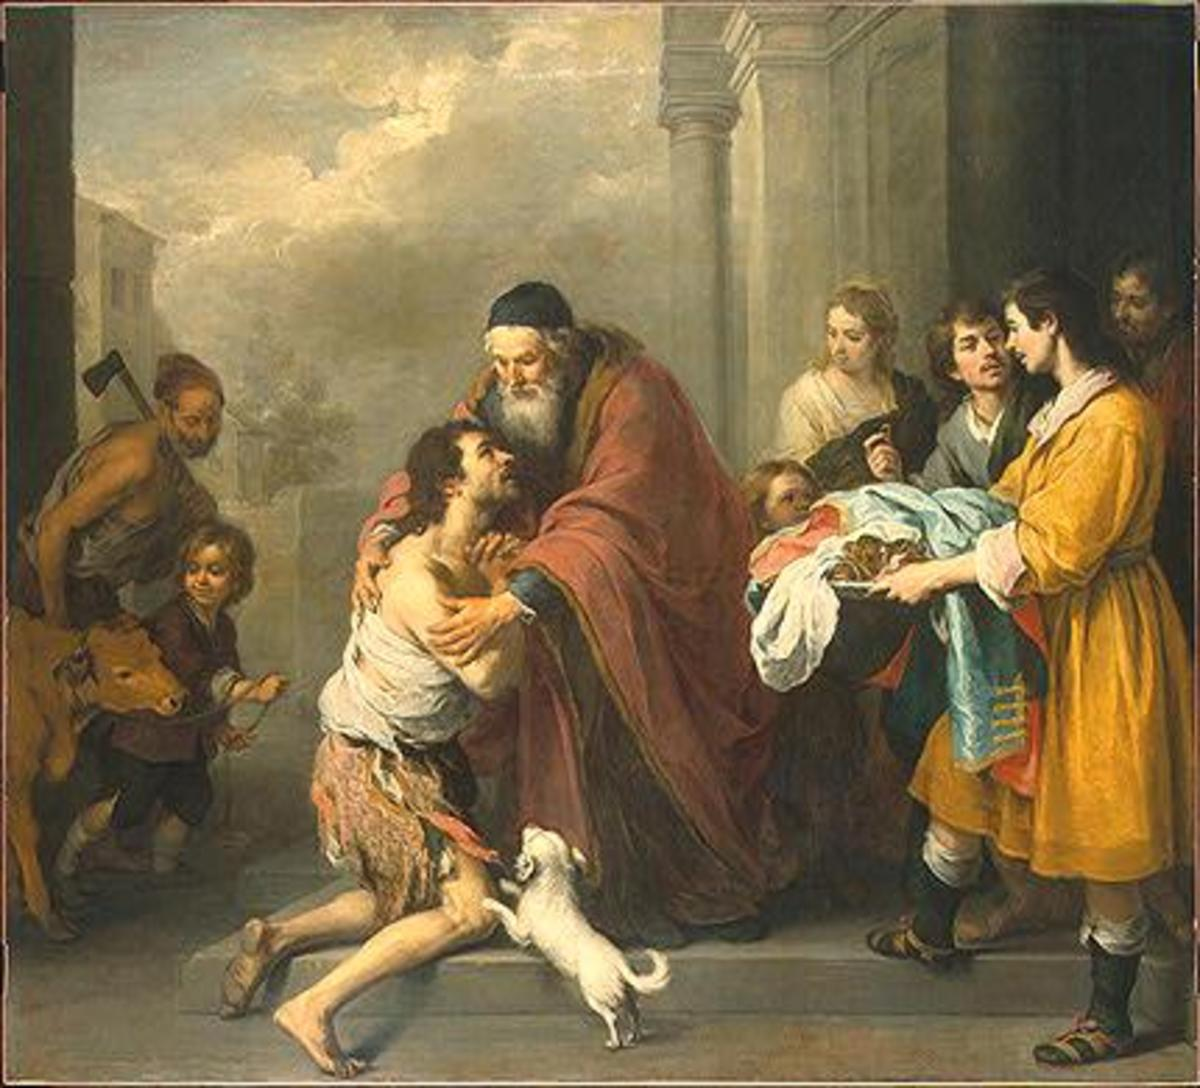 http://www.thechristianwebsite.com/images/ProdigalSonReturningToHisFather.jpg